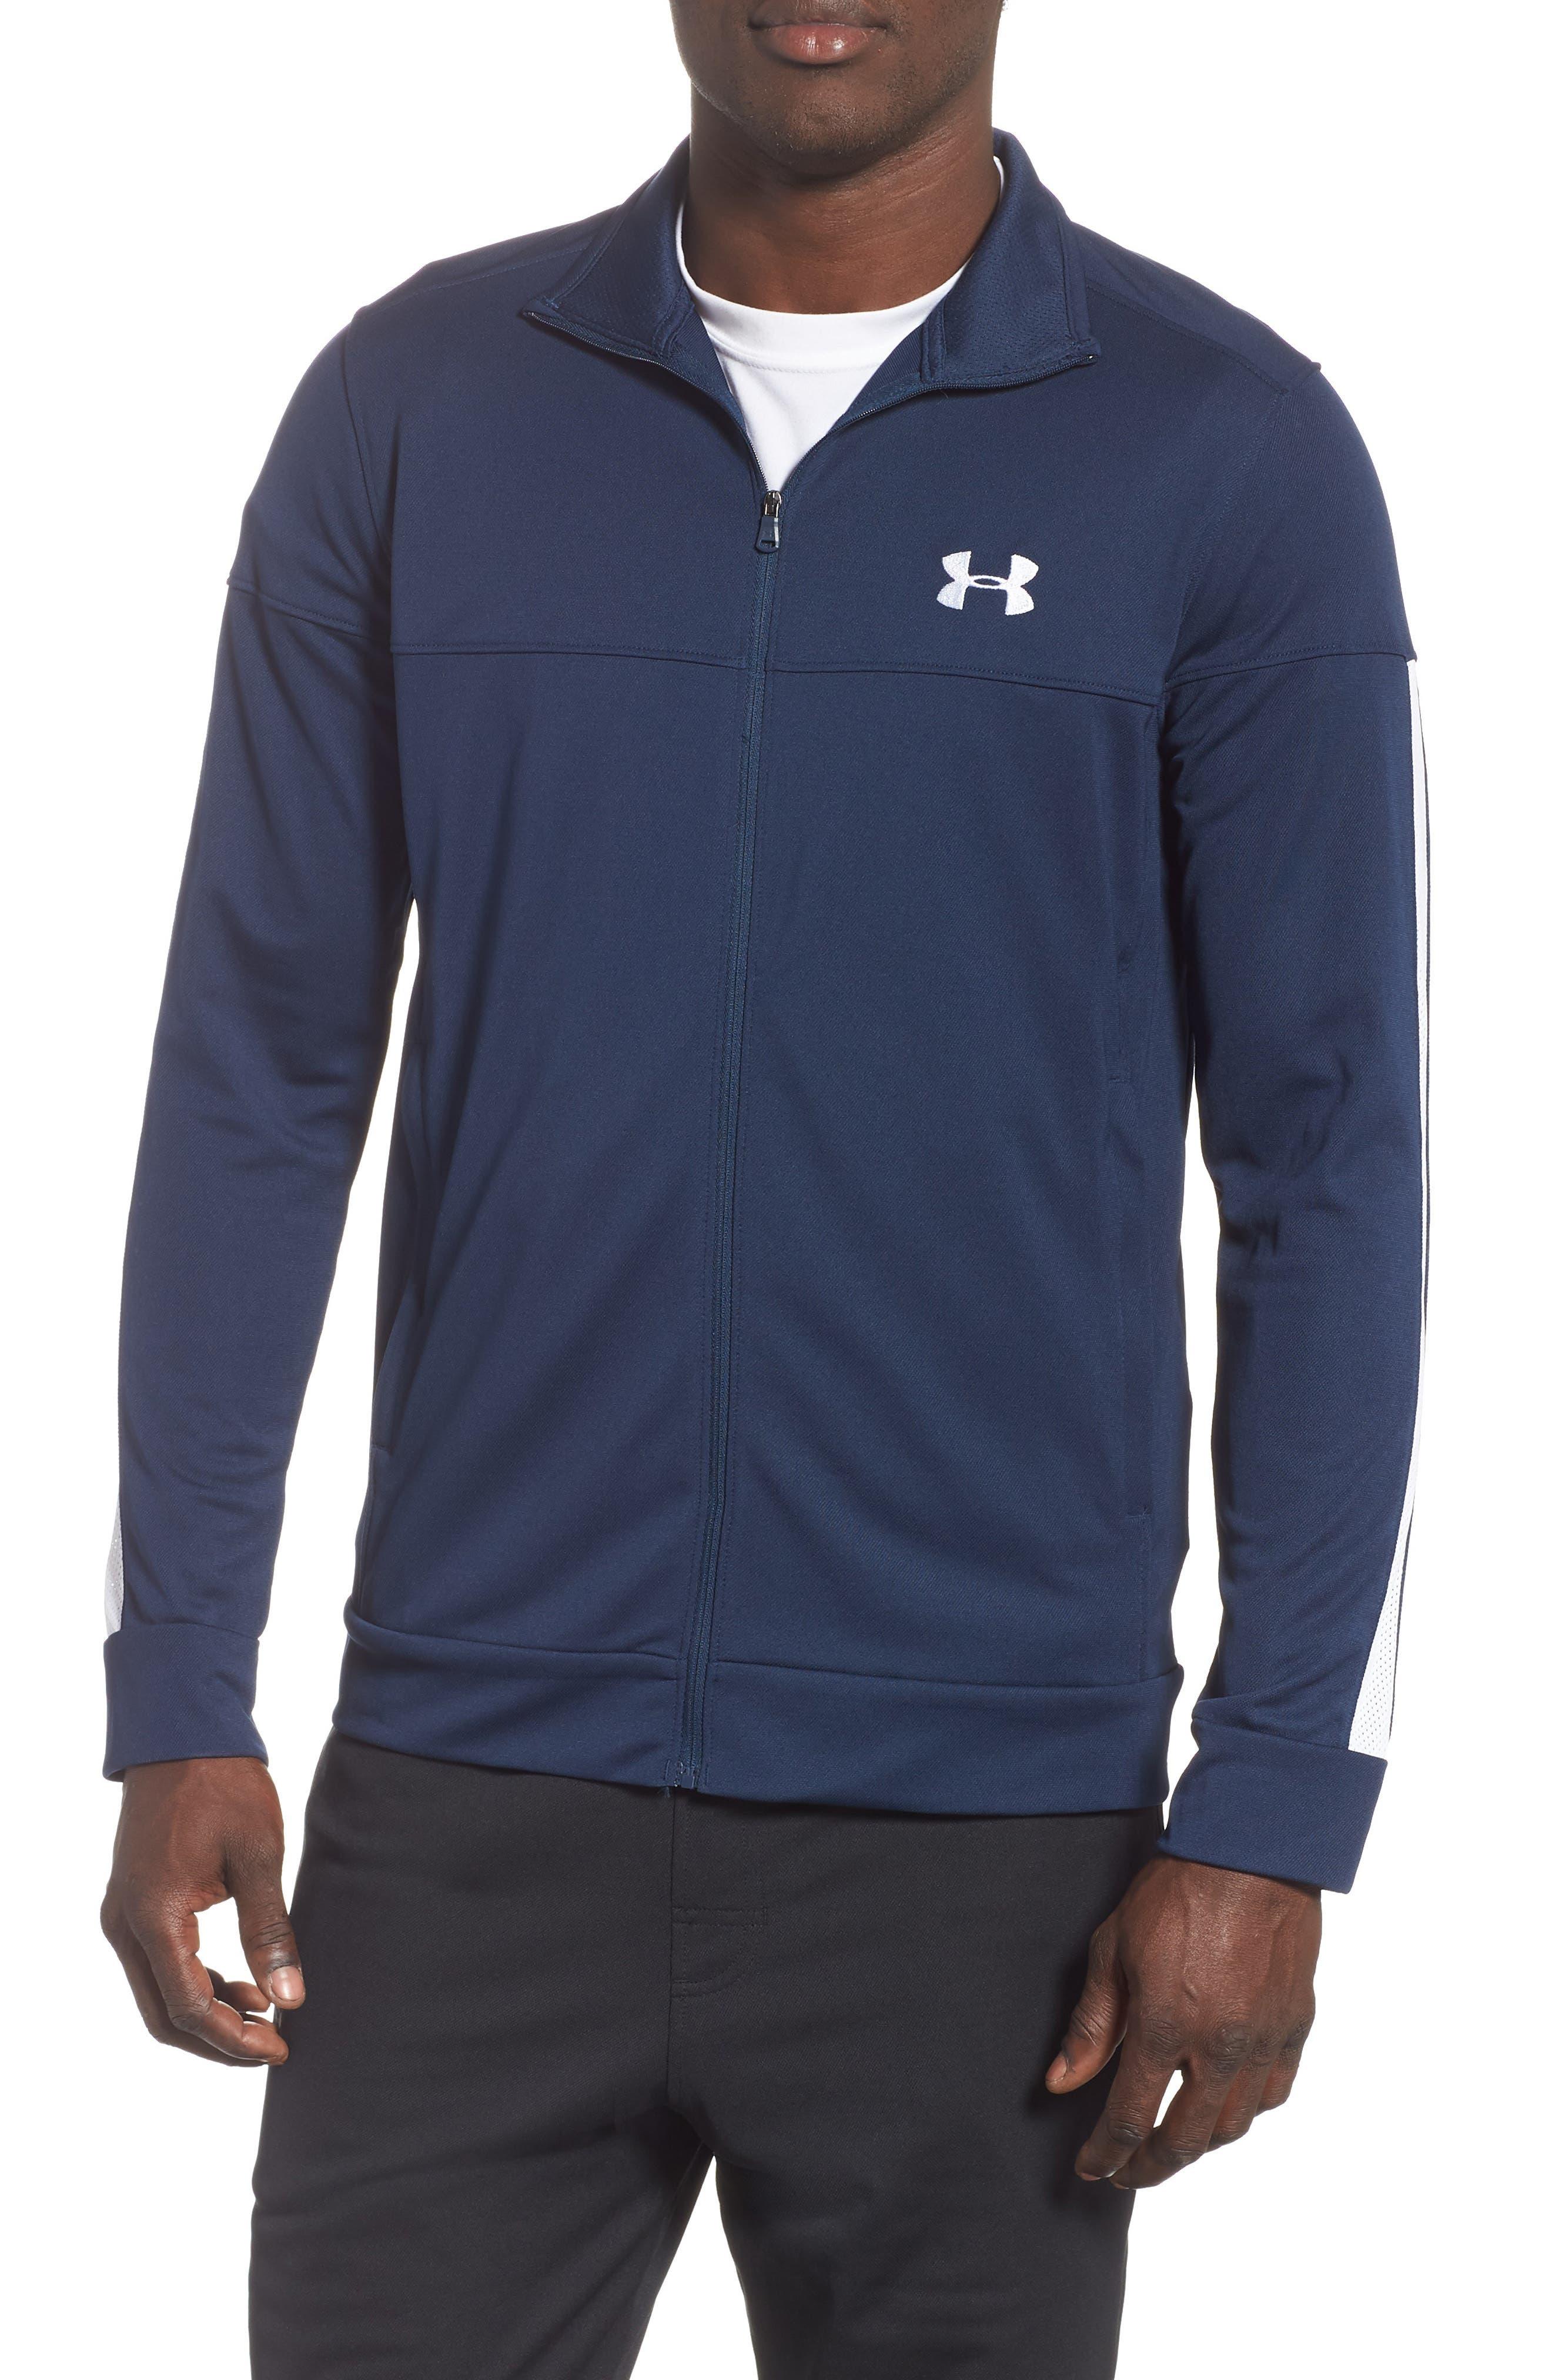 Under Armour Sportstyle Pique Track Jacket, Blue